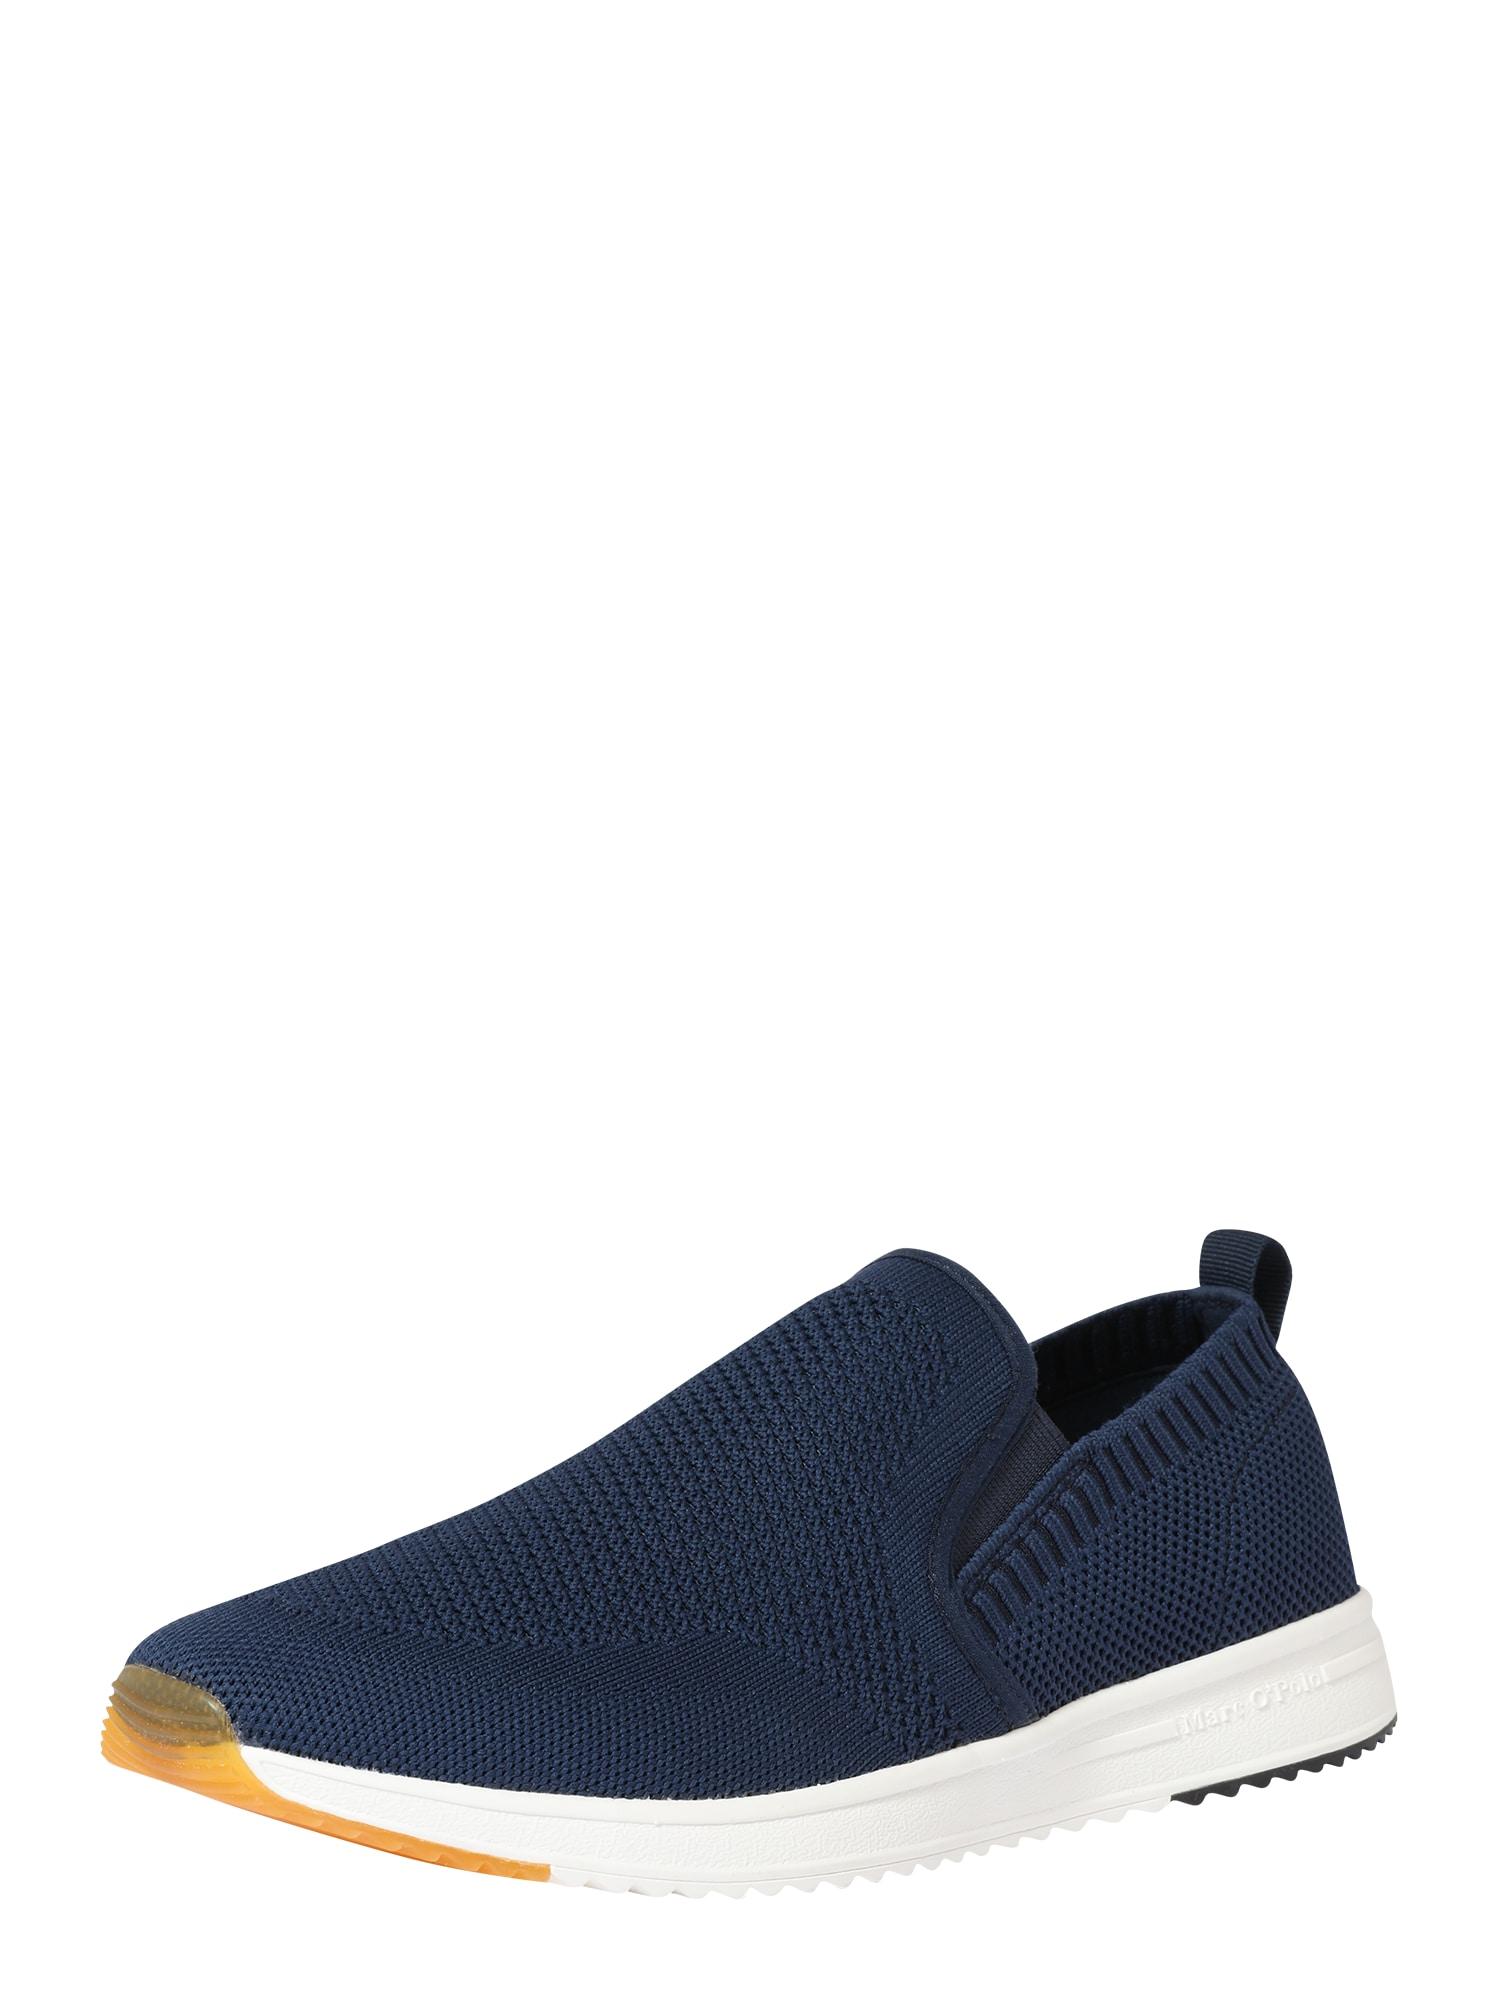 Marc O'Polo Slip on boty  tmavě modrá